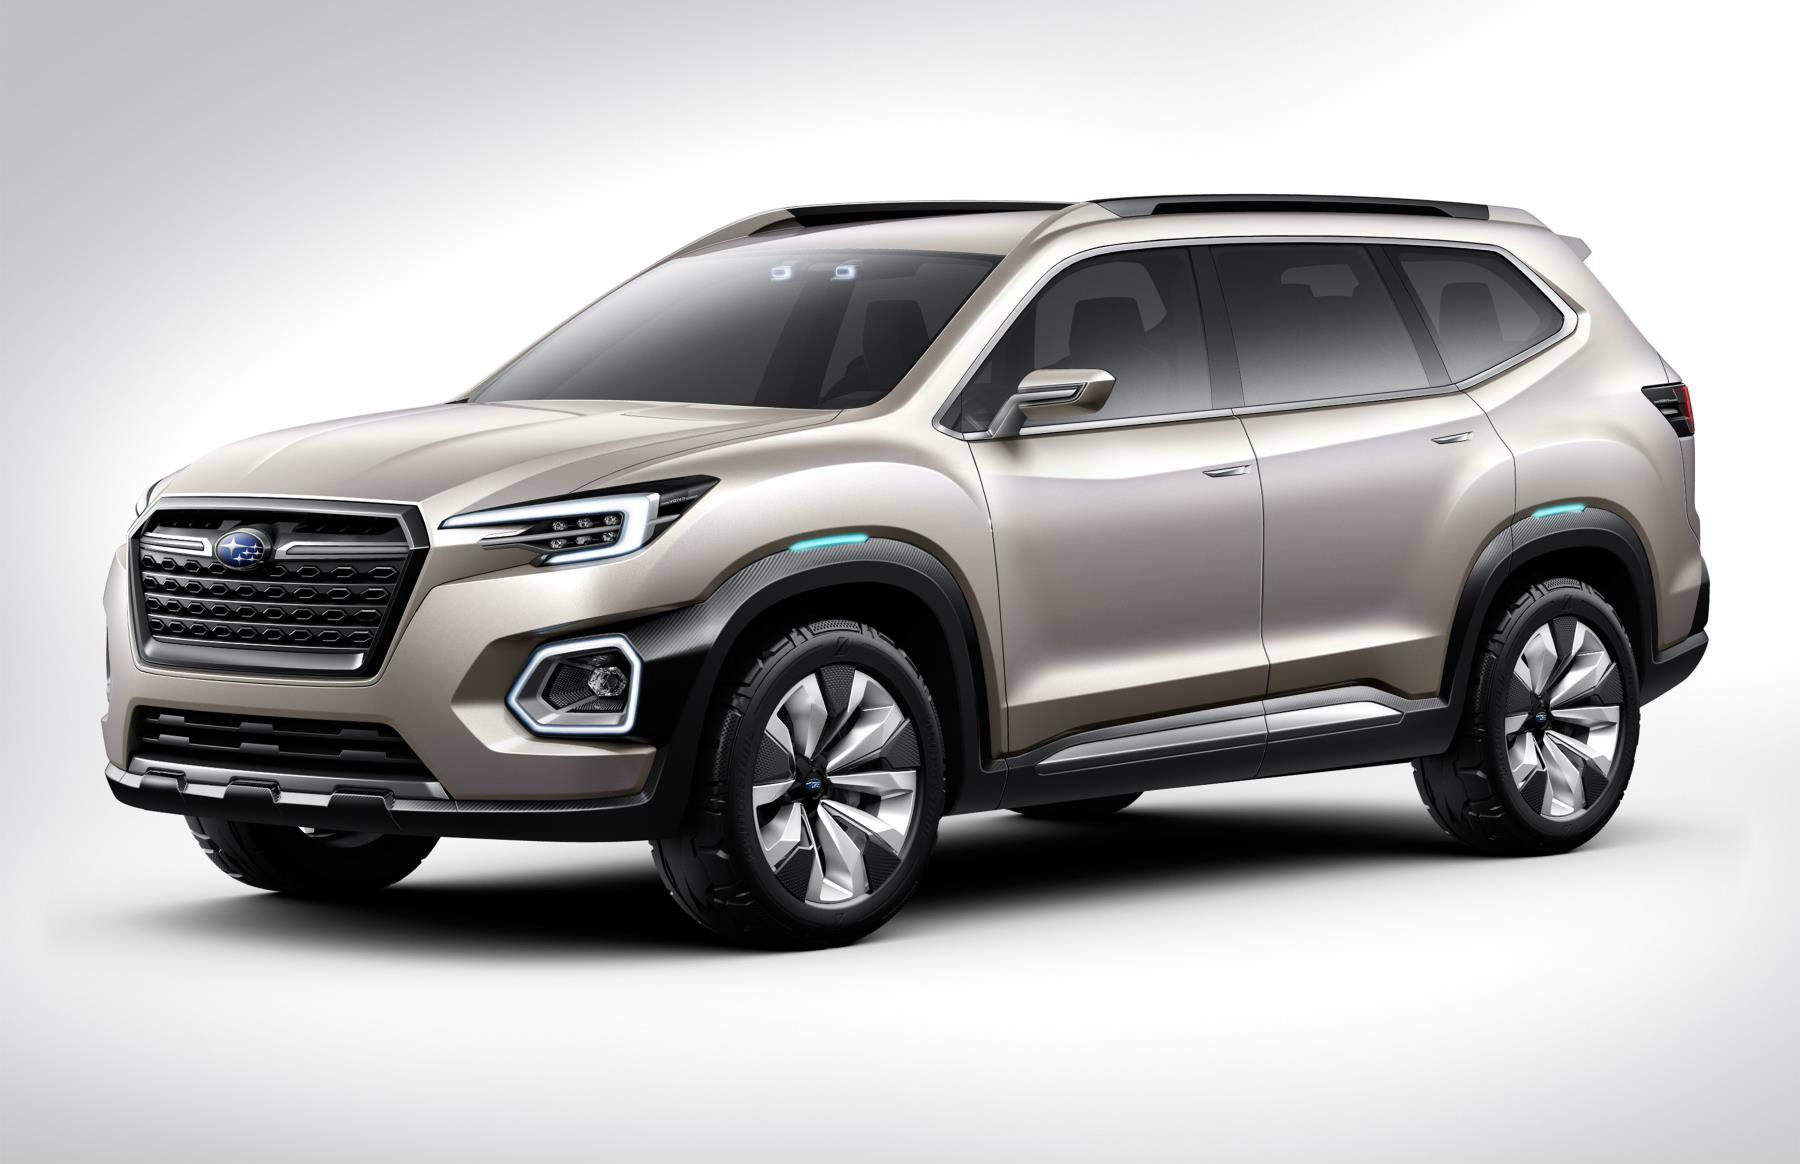 Subaru Tribeca 2016 >> 2019 Subaru Three Row Crossover Is Expected To Get Hybrid ...